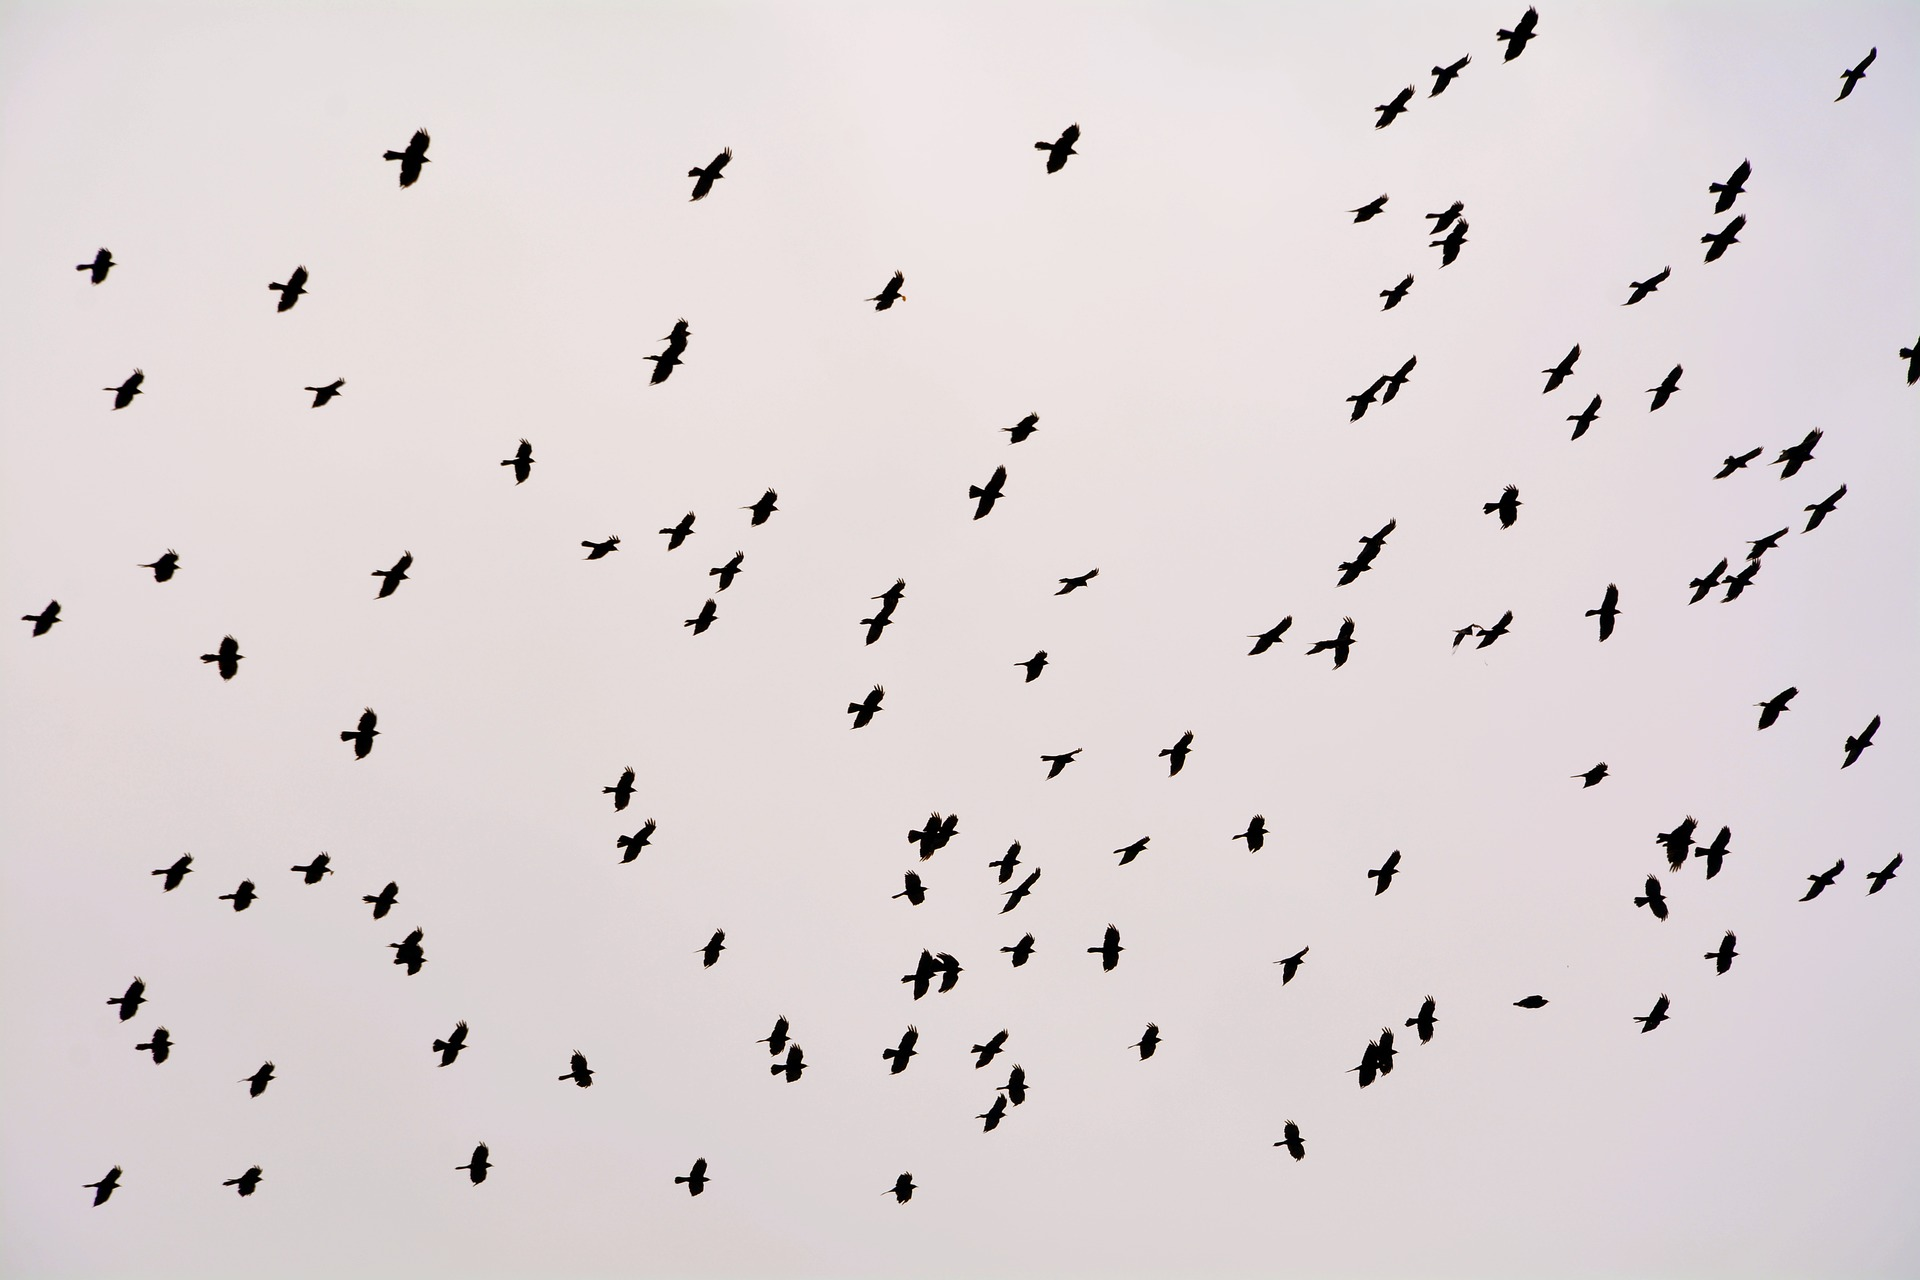 flock-2574265_1920